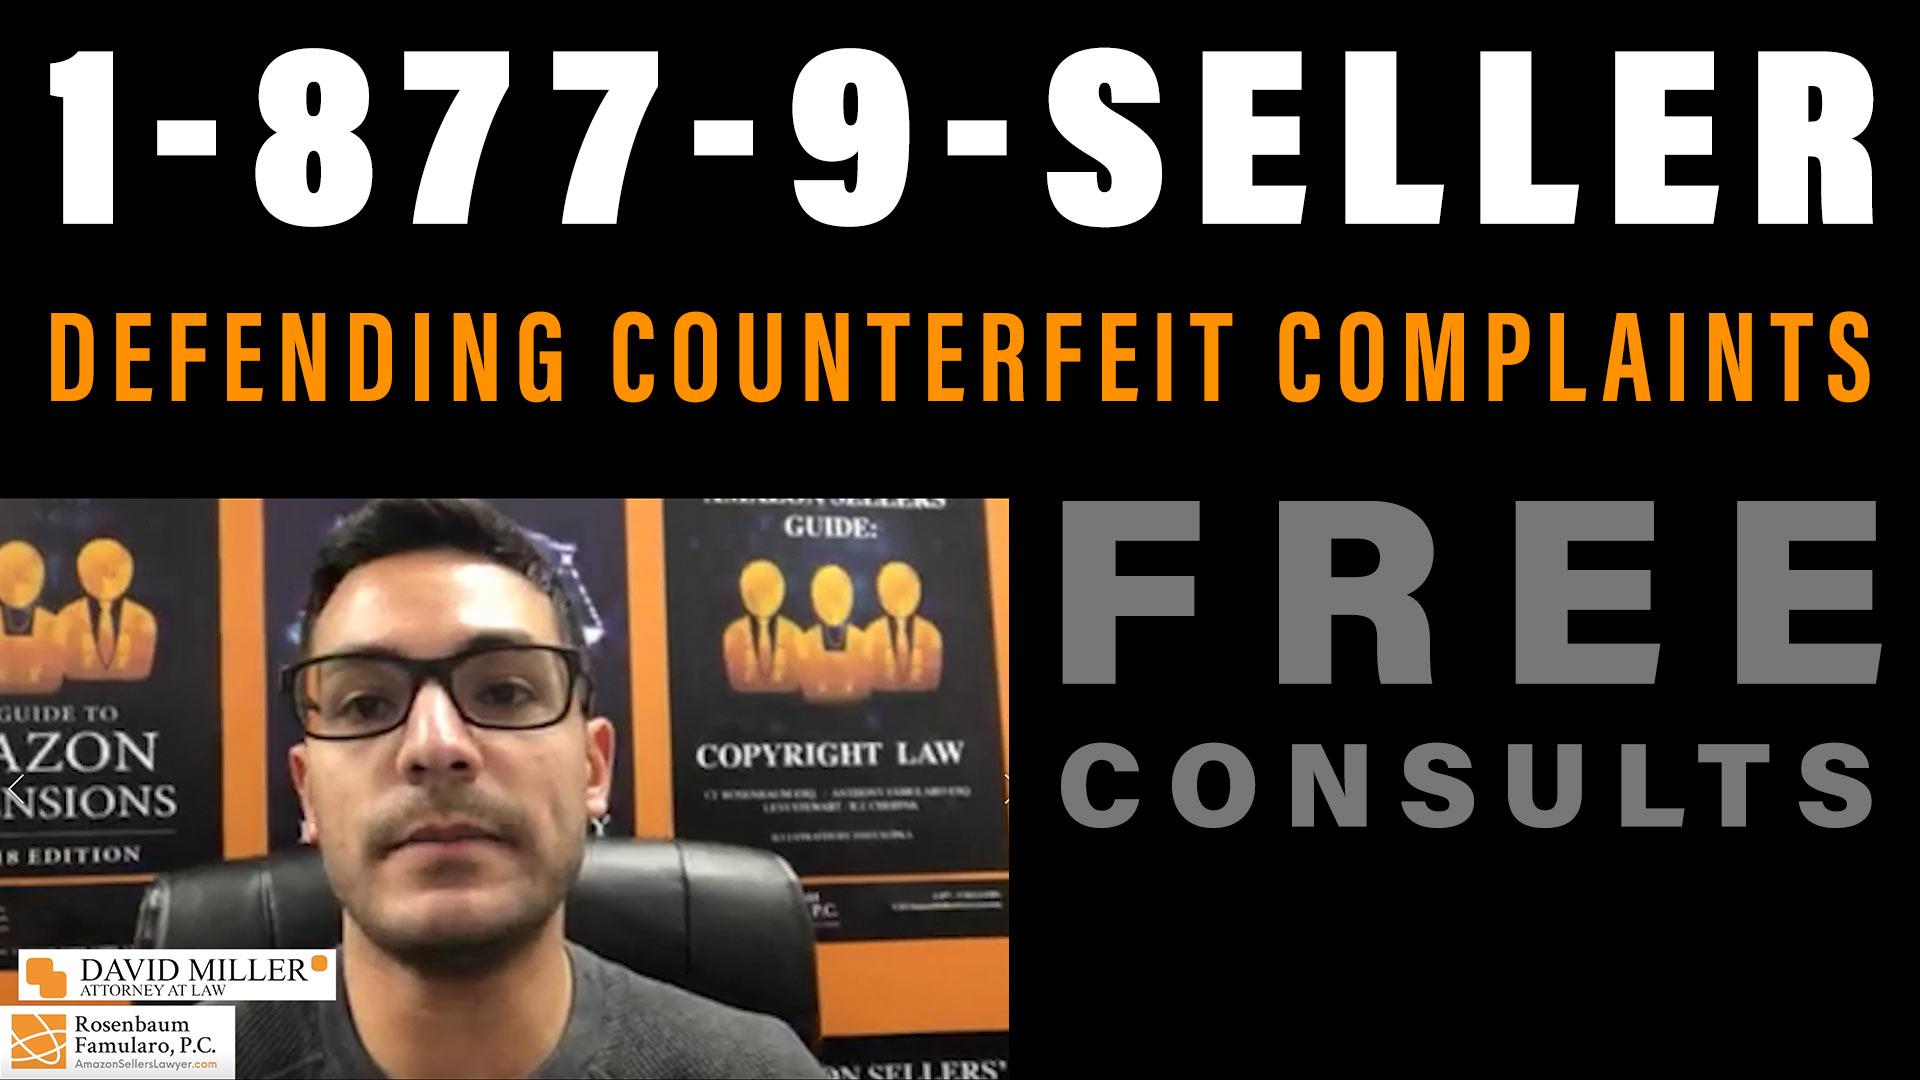 Defending Counterfeit Complaints on Amazon